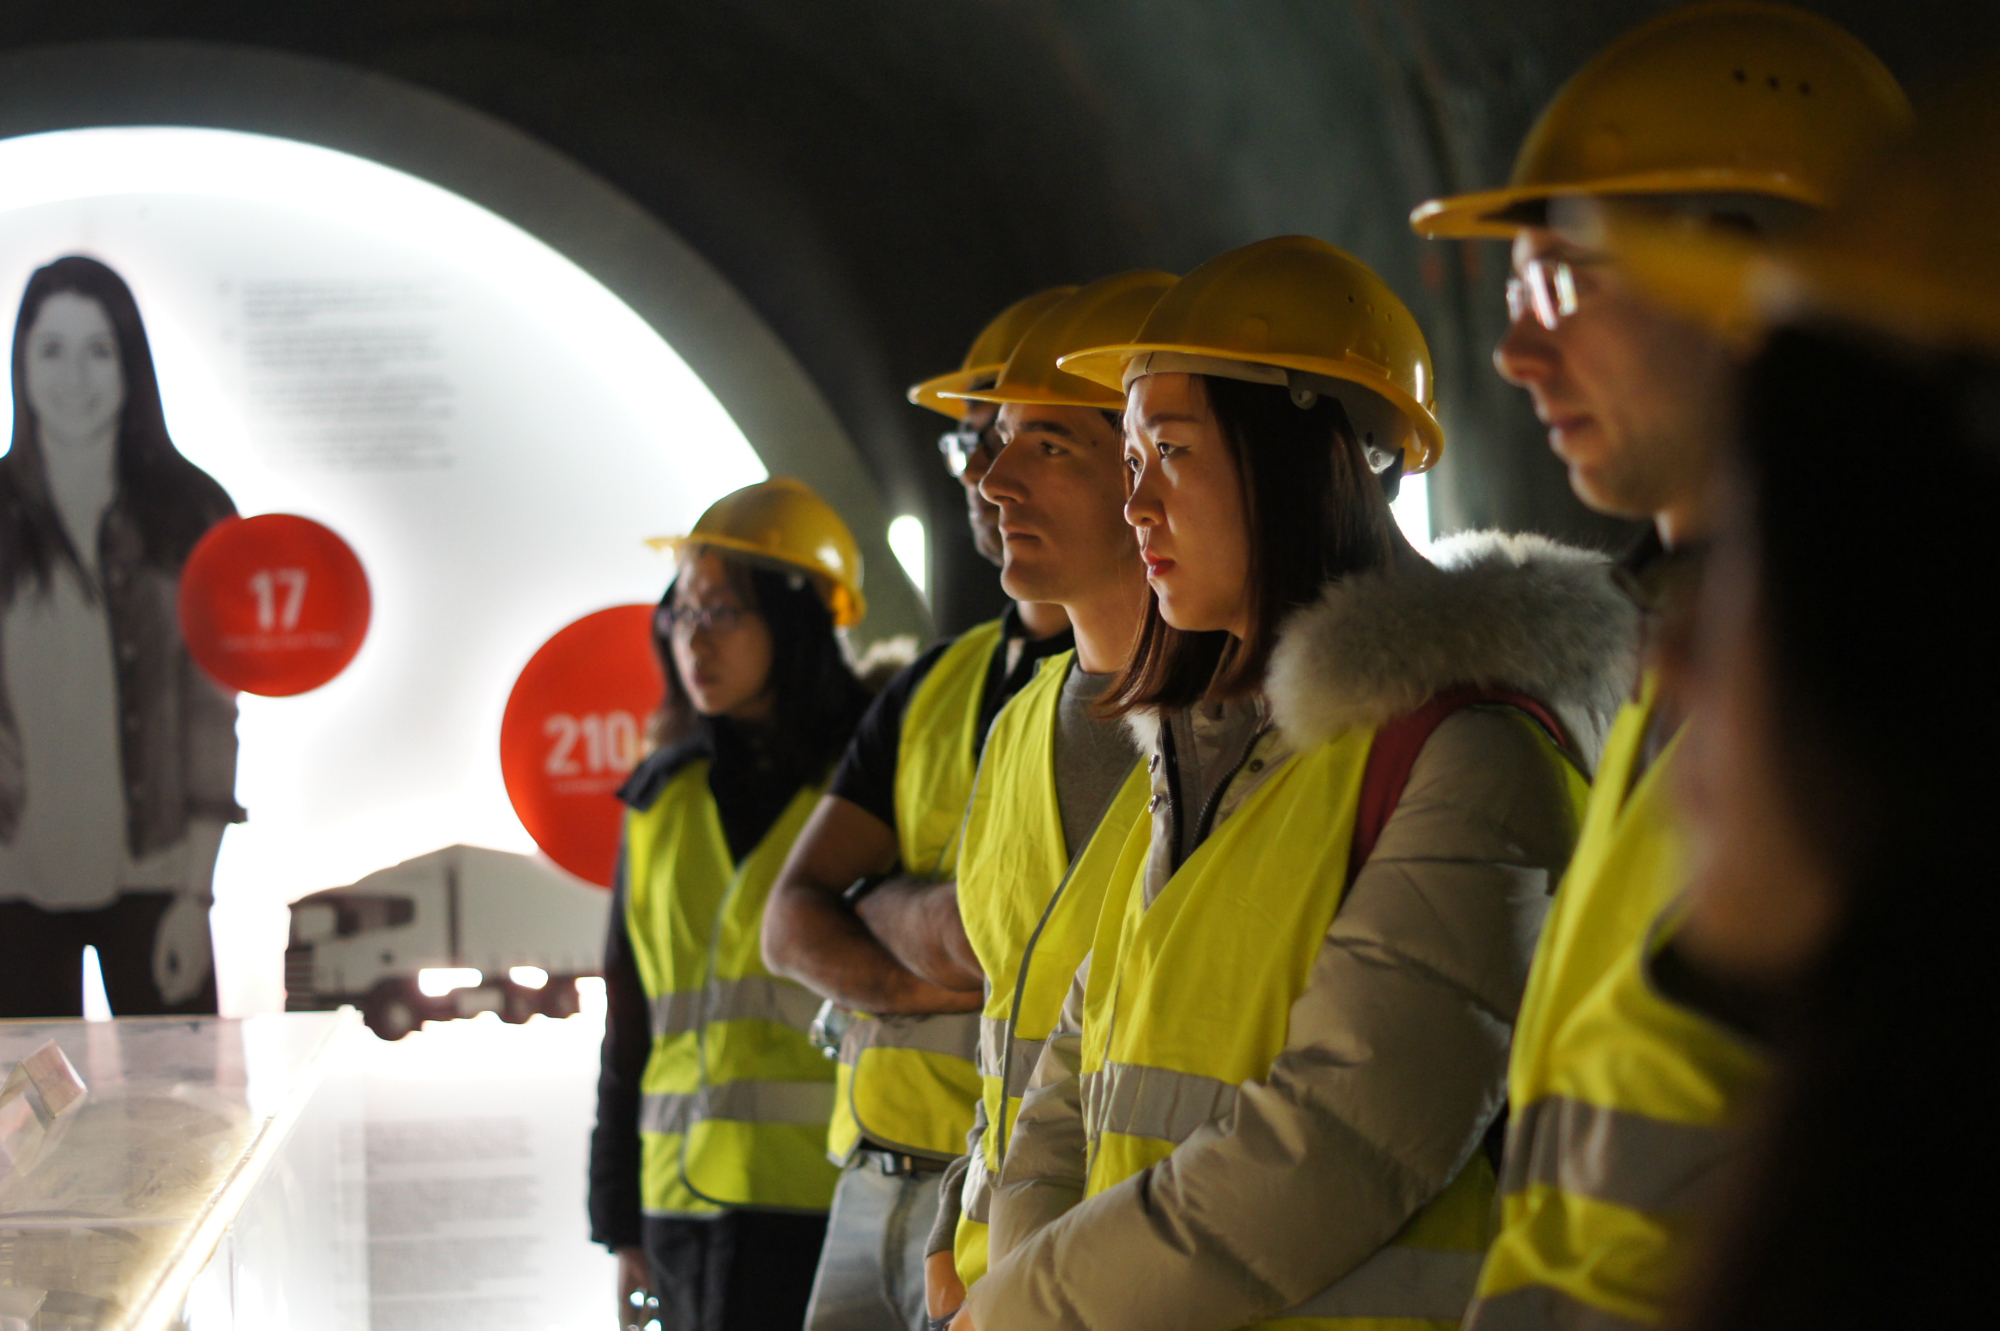 Students in the Gotthard Basistunnel